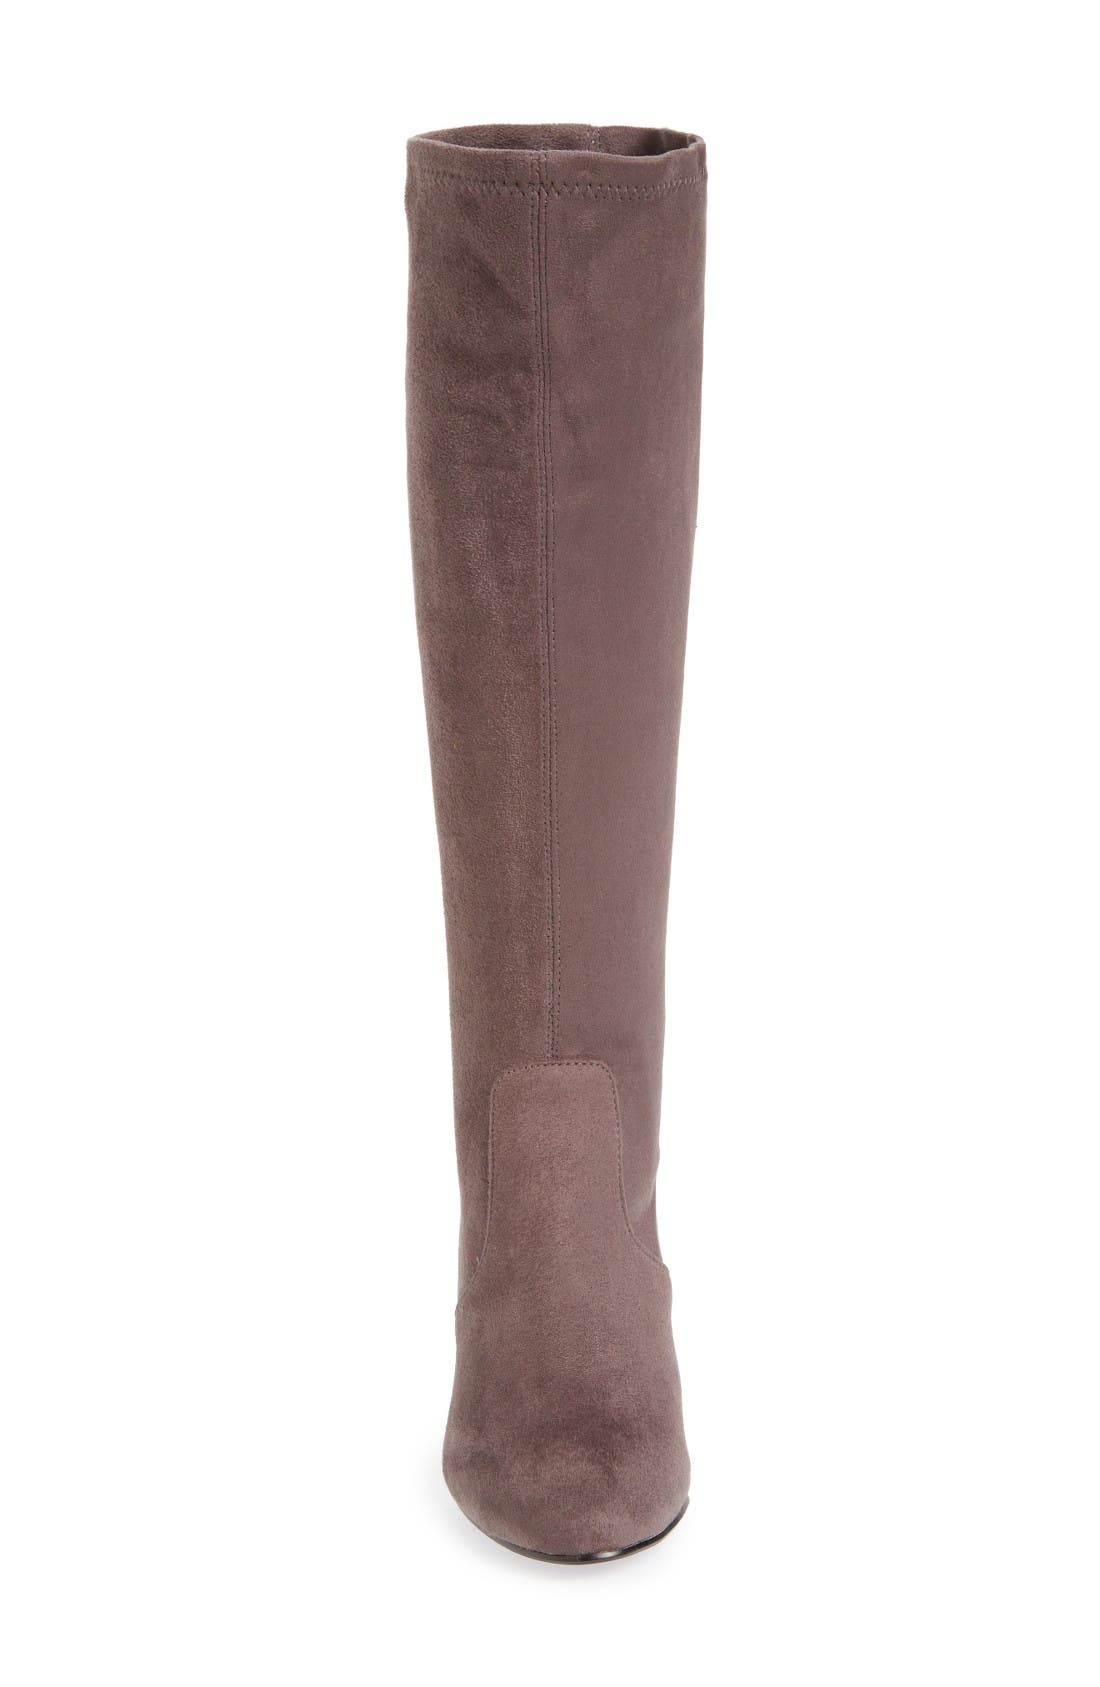 Alternate Image 3  - Steve Madden Emerge Boot (Women) (Narrow Calf)